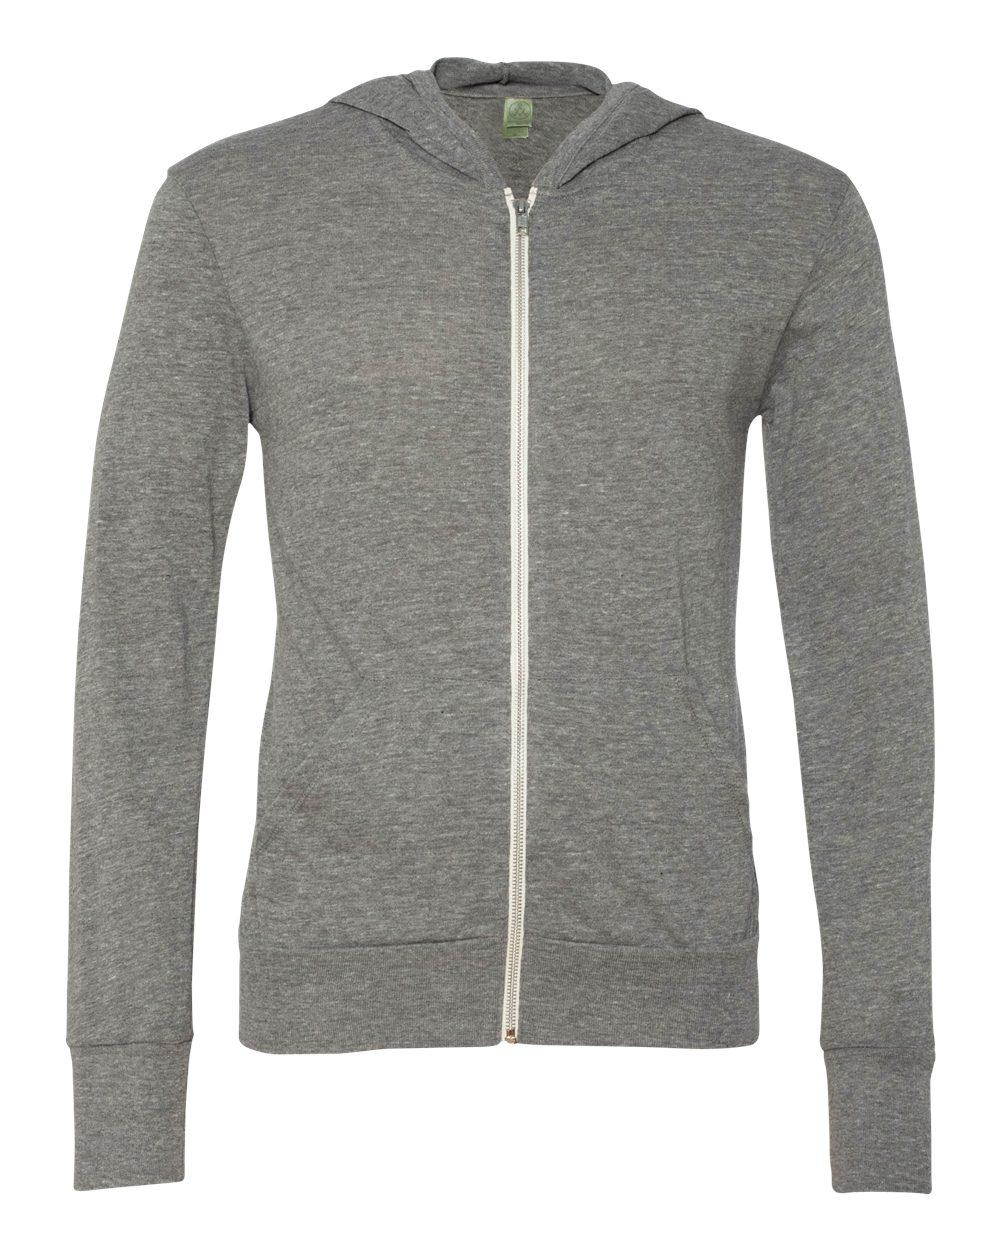 Alternative-Mens-Eco-Jersey-Hooded-Full-Zip-T-Shirt-Blank-Plain-1970e1-up-to-3XL miniature 9